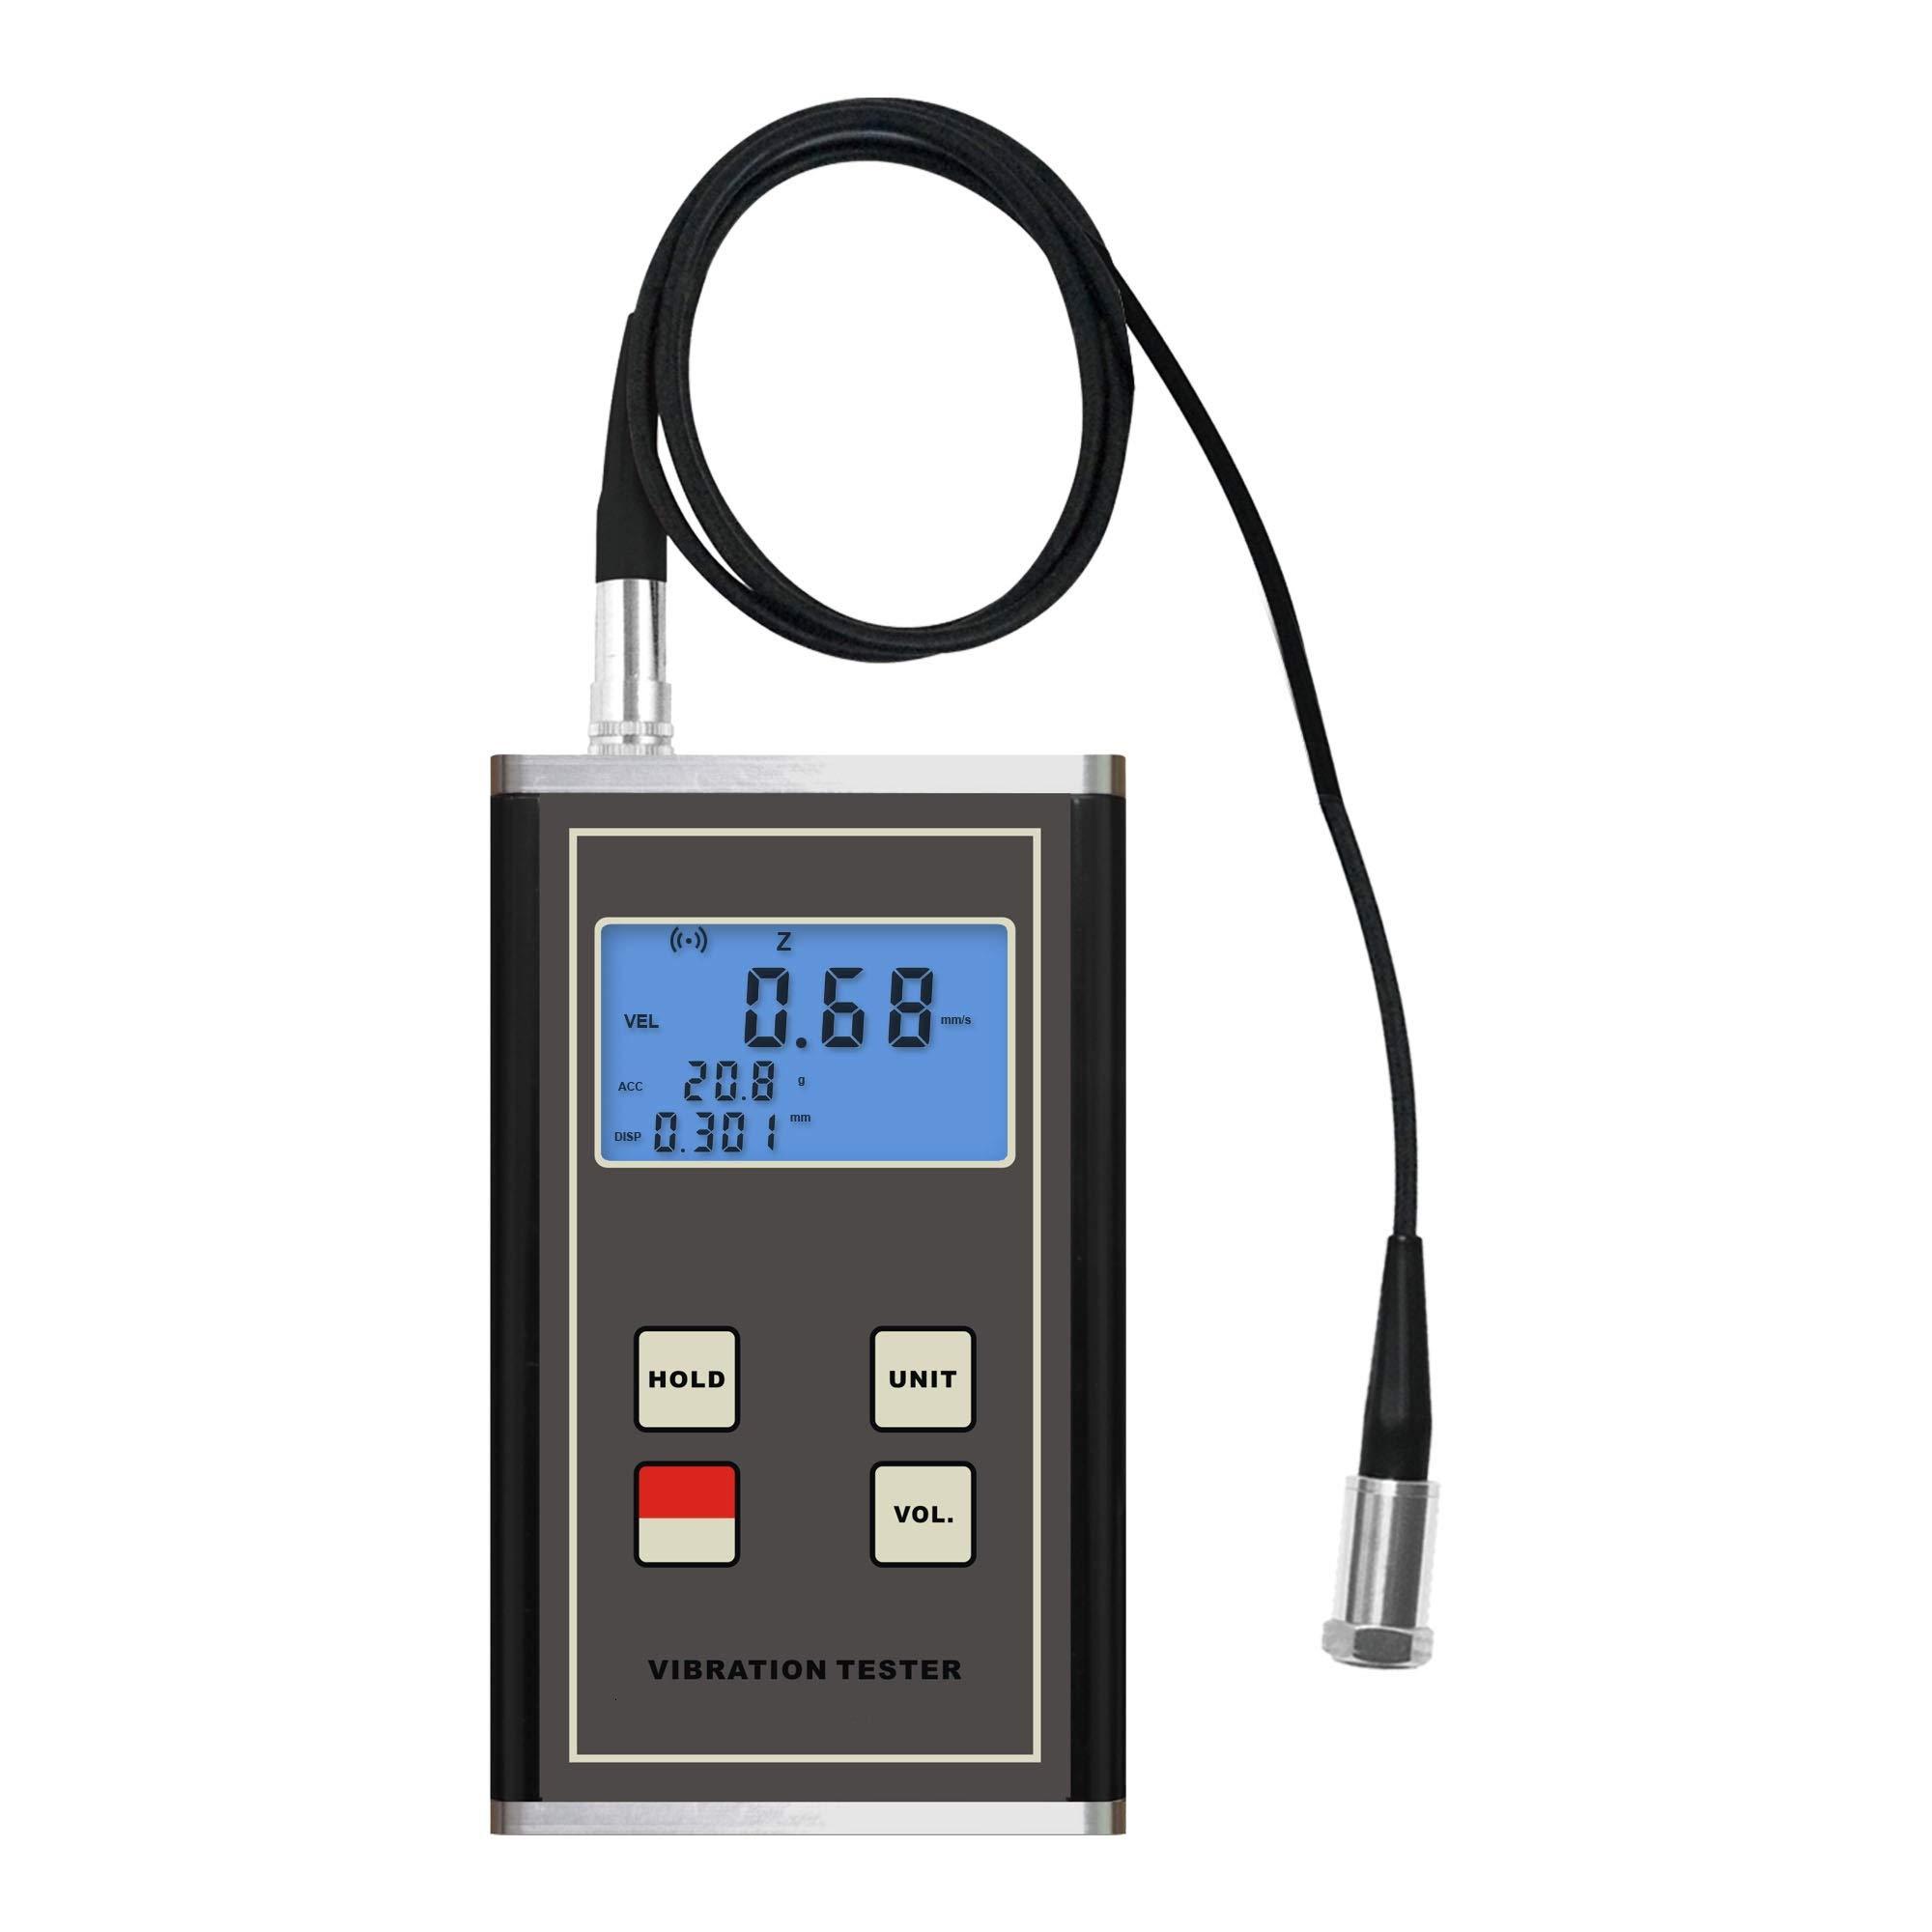 GAO-VIB-104 Vibration Meter with Good Accelerometer (Vibration Measure), Piezoelectric Vibration Sensor,2.0 v AC Load Resistance 10 k Output,Wide Frequency Range, Accelerometer.